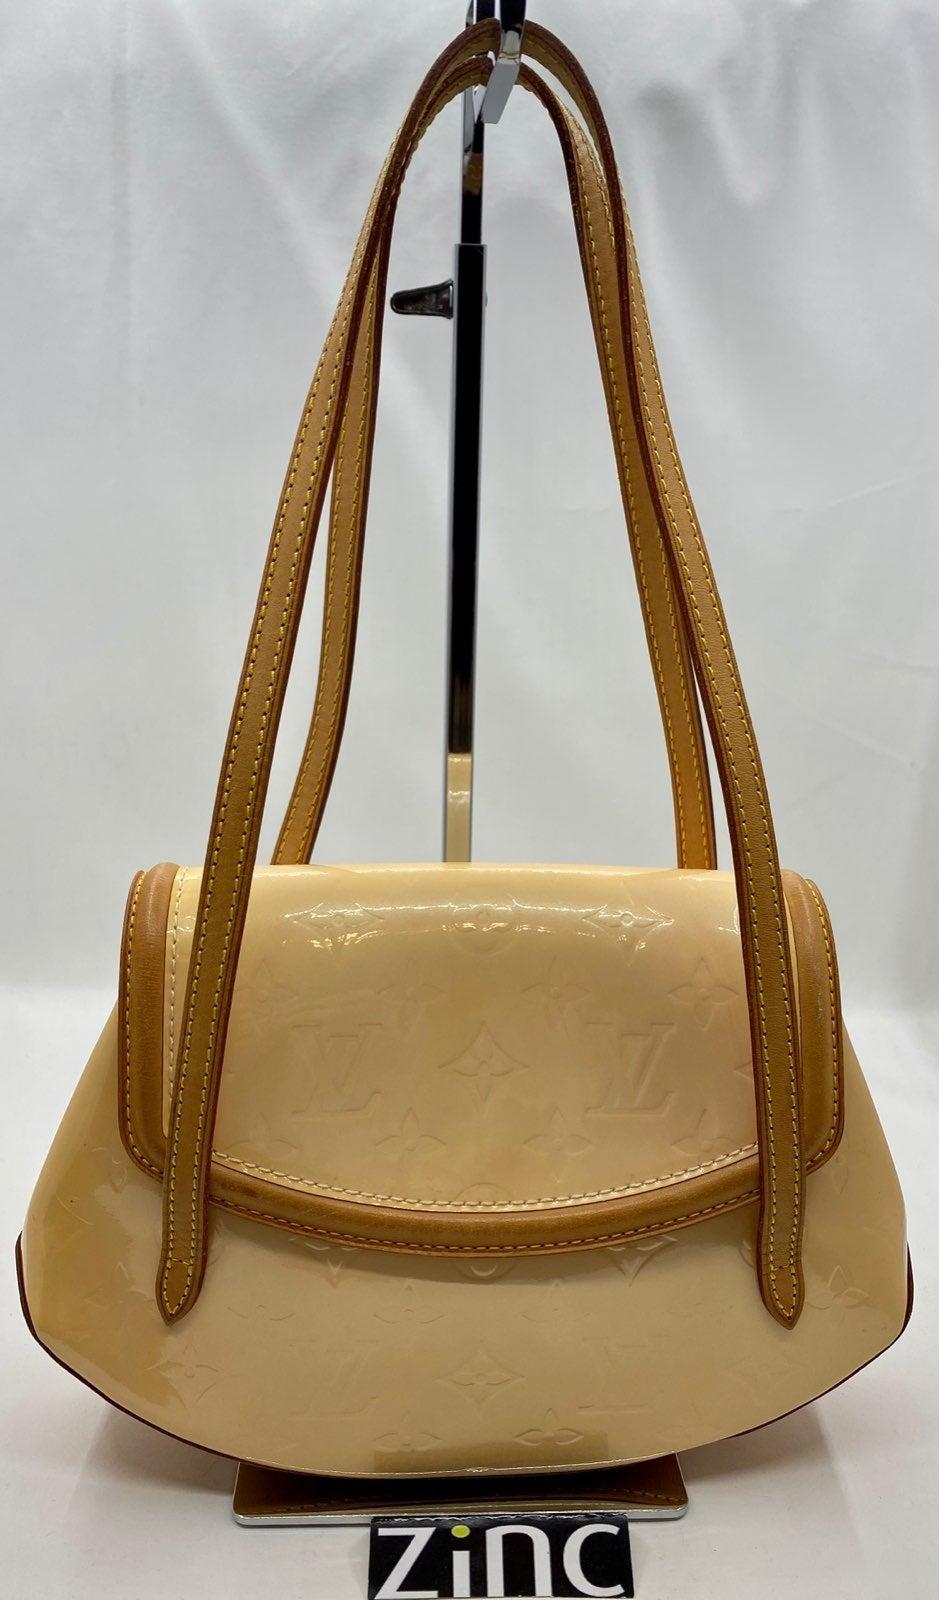 Louis Vuitton Vernis Biscayne Shoulder